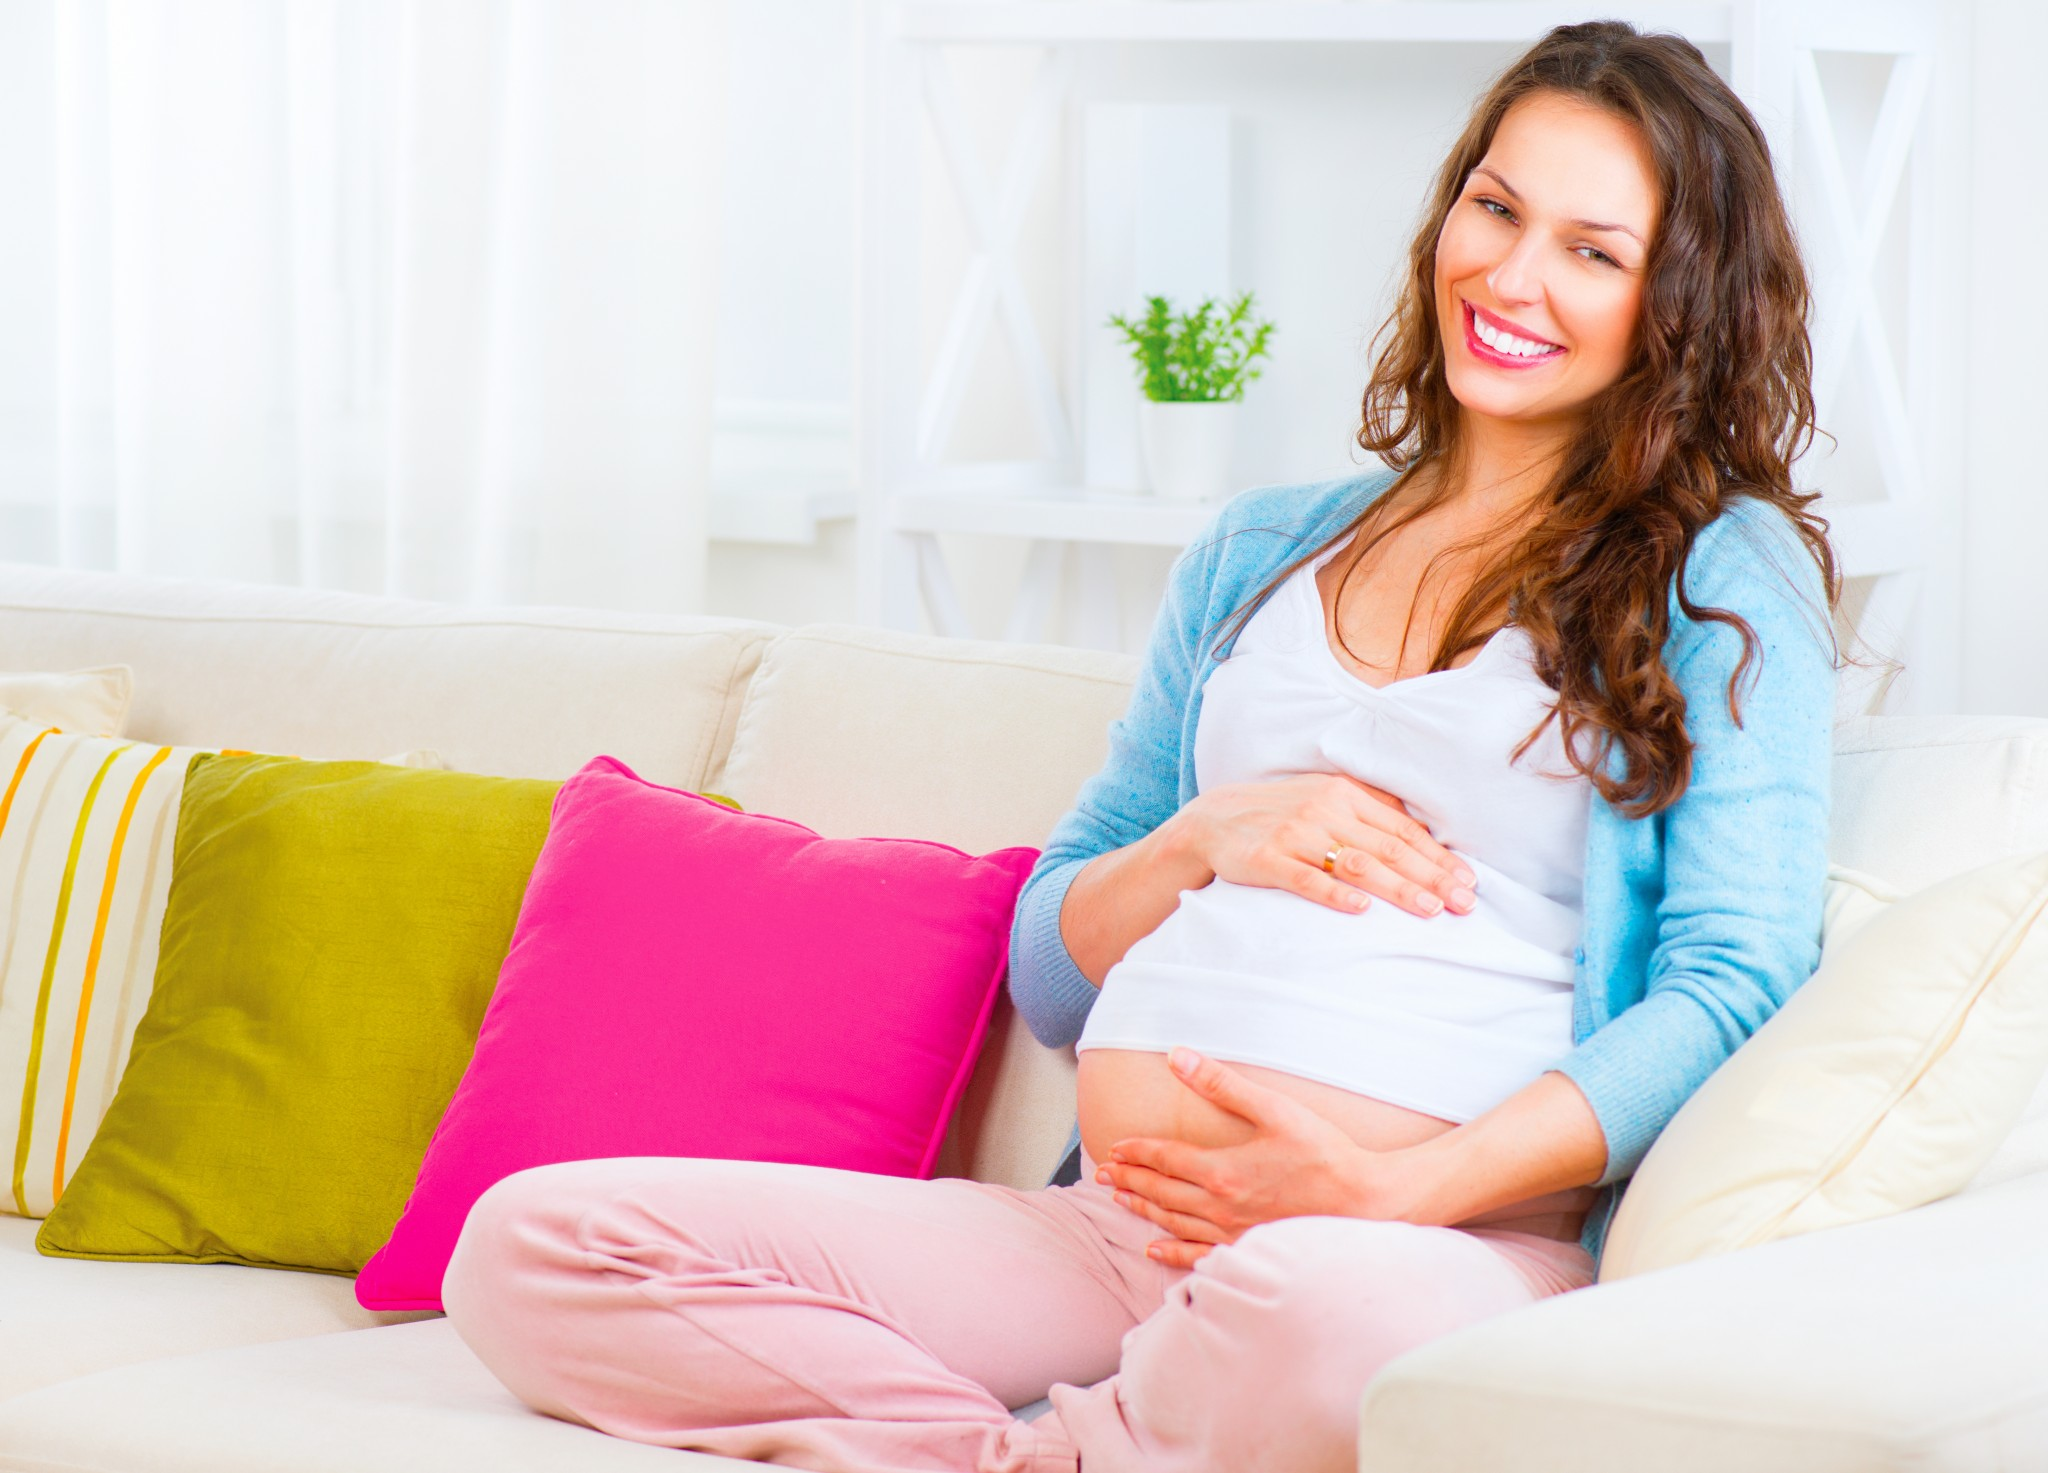 bigstock-Pregnant-Happy-smiling-Woman-s-77746199